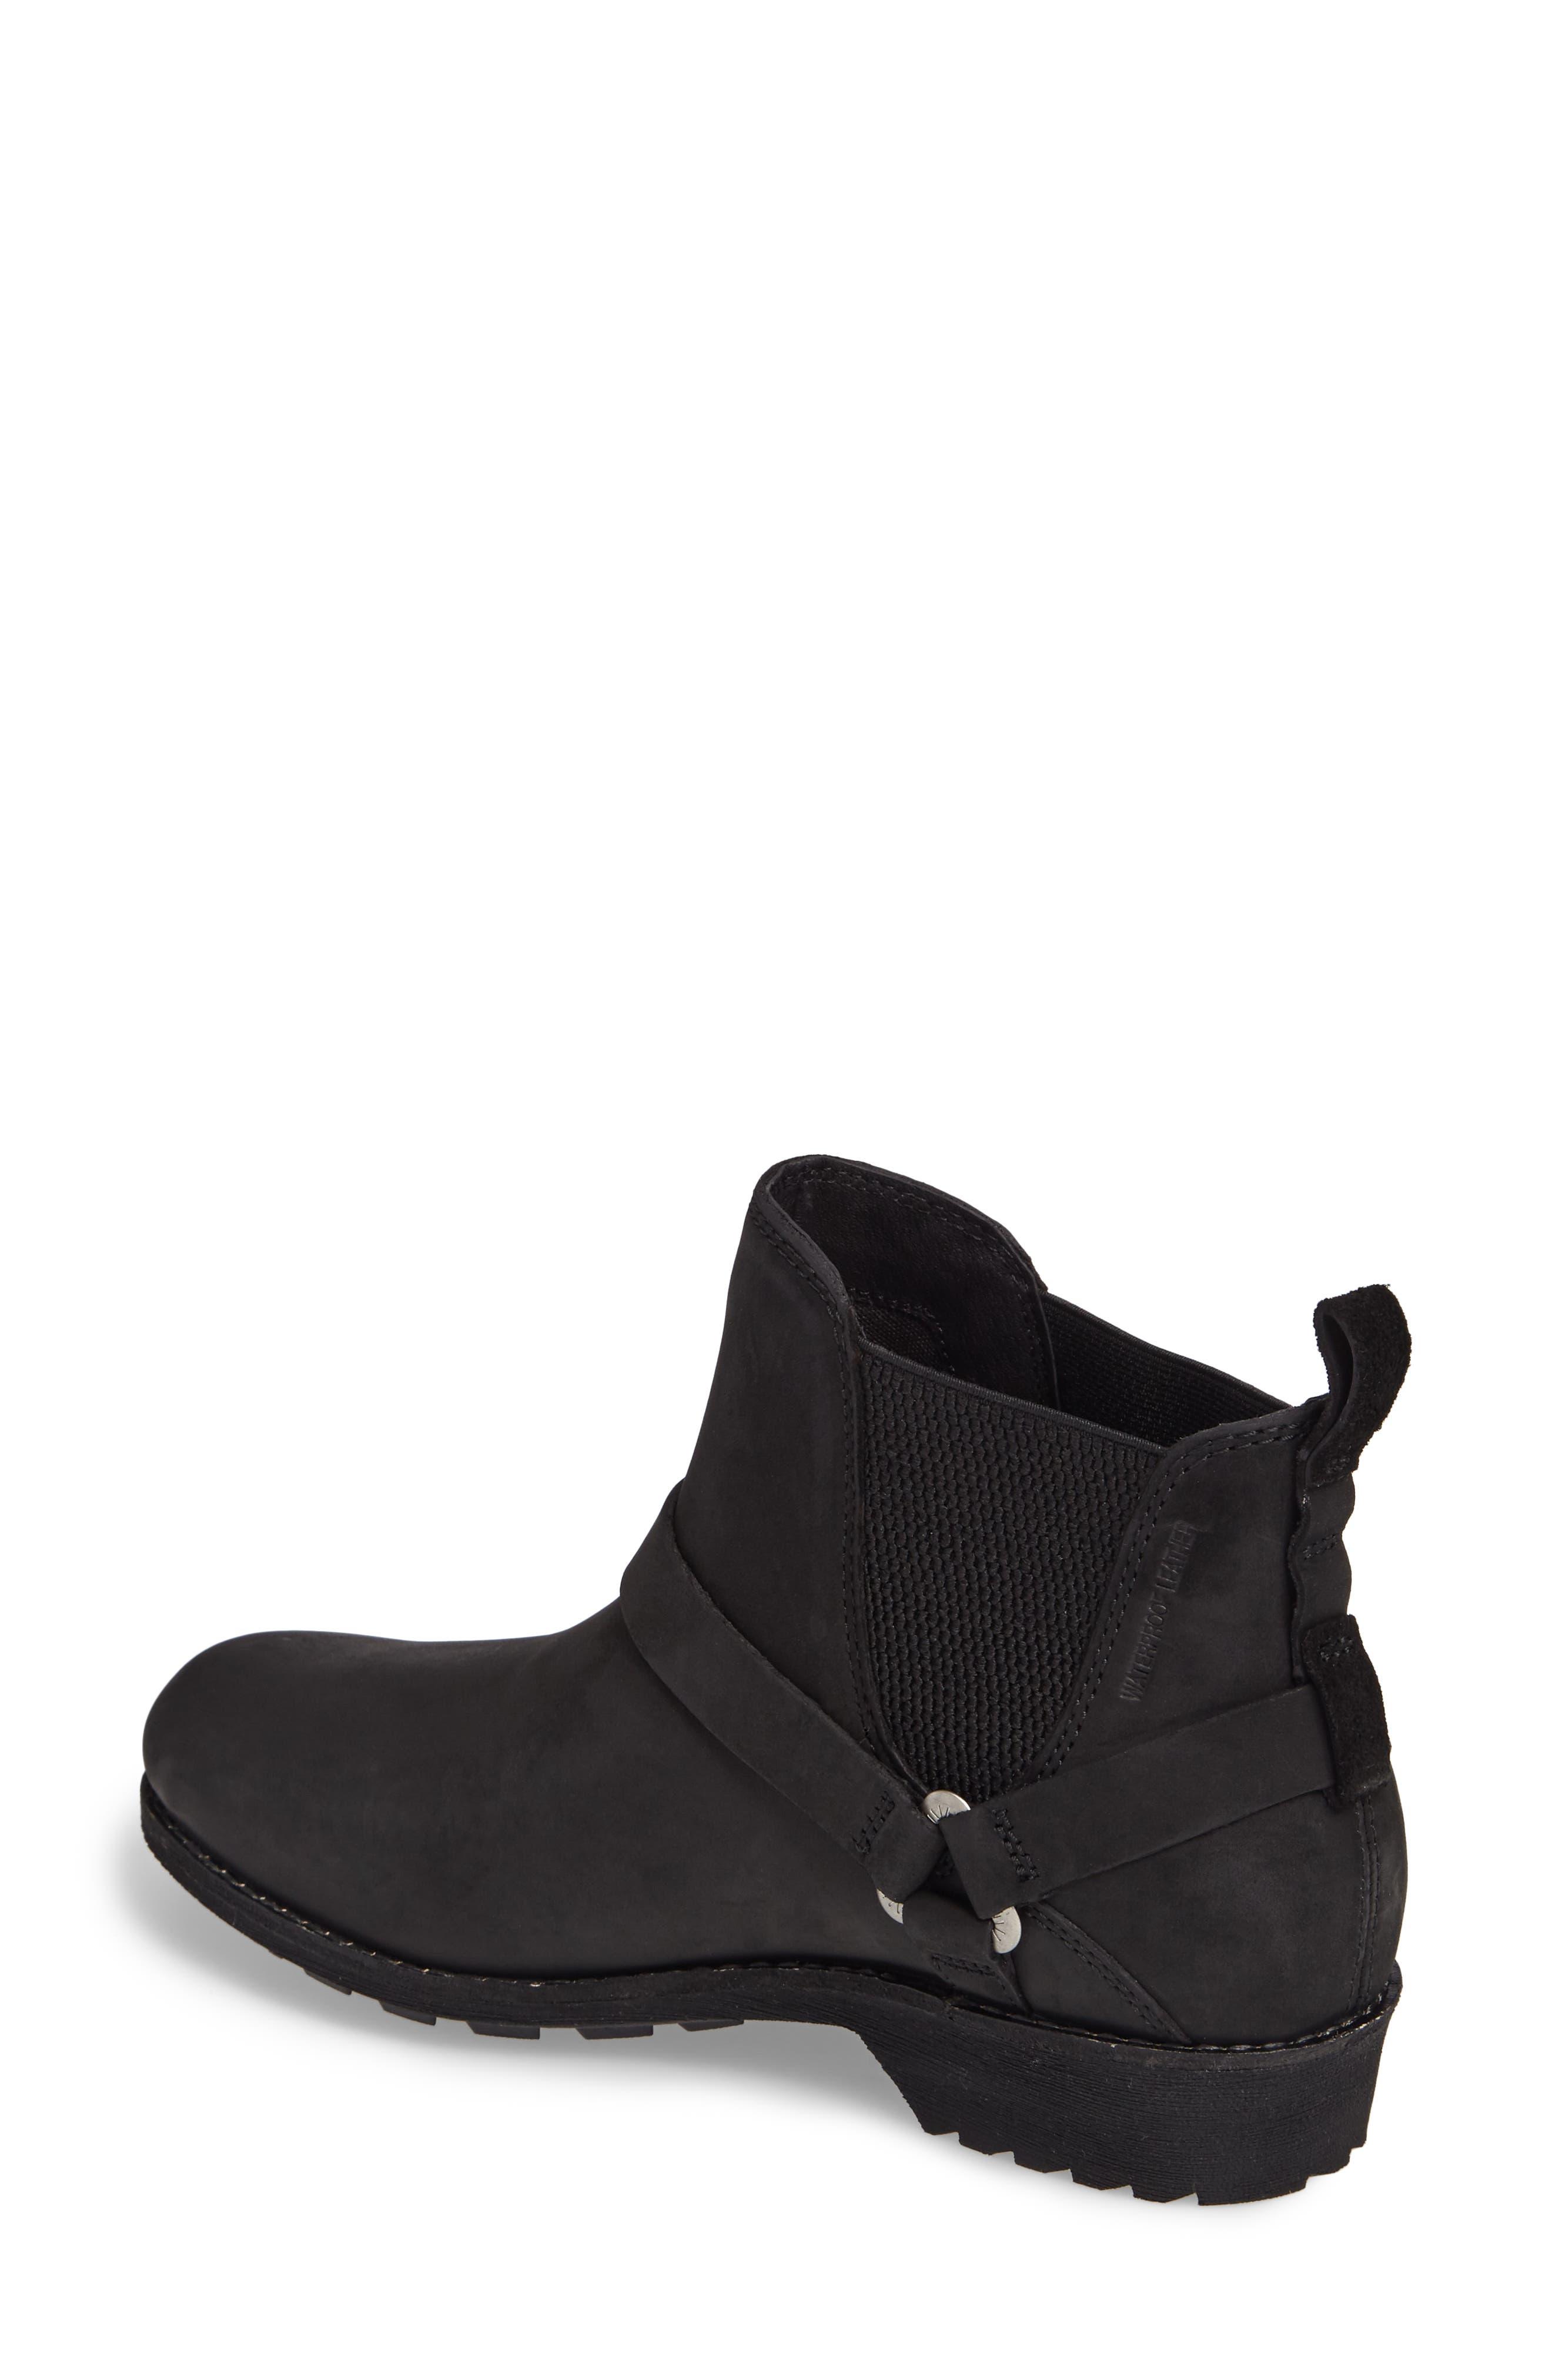 TEVA, De La Vina Dos Waterproof Chelsea Boot, Alternate thumbnail 2, color, BLACK LEATHER